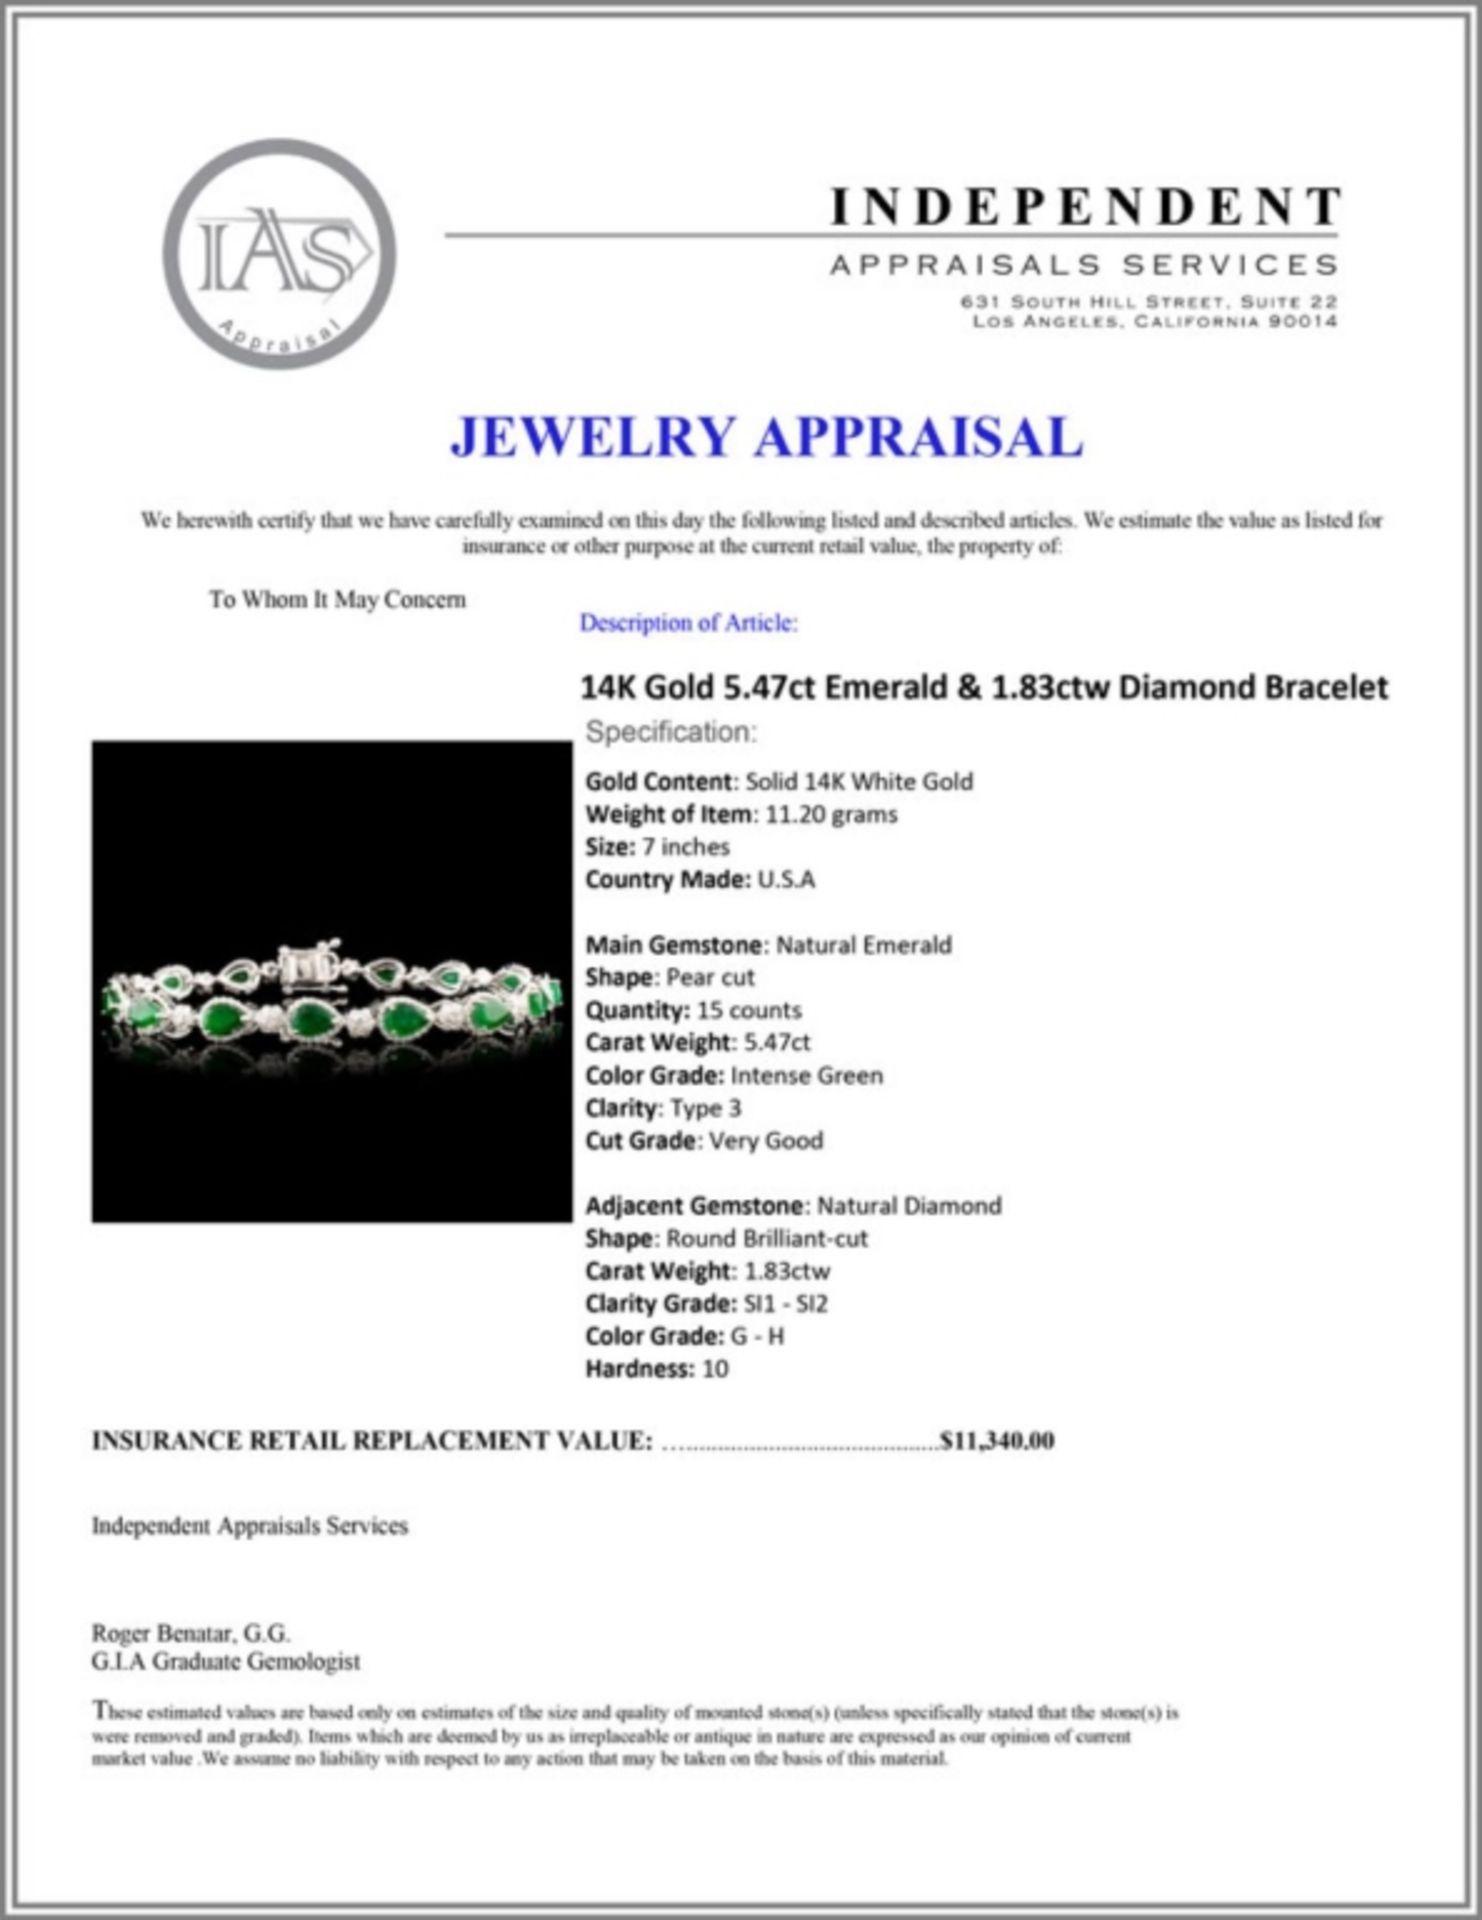 14K Gold 5.47ct Emerald & 1.83ctw Diamond Bracelet - Image 4 of 4